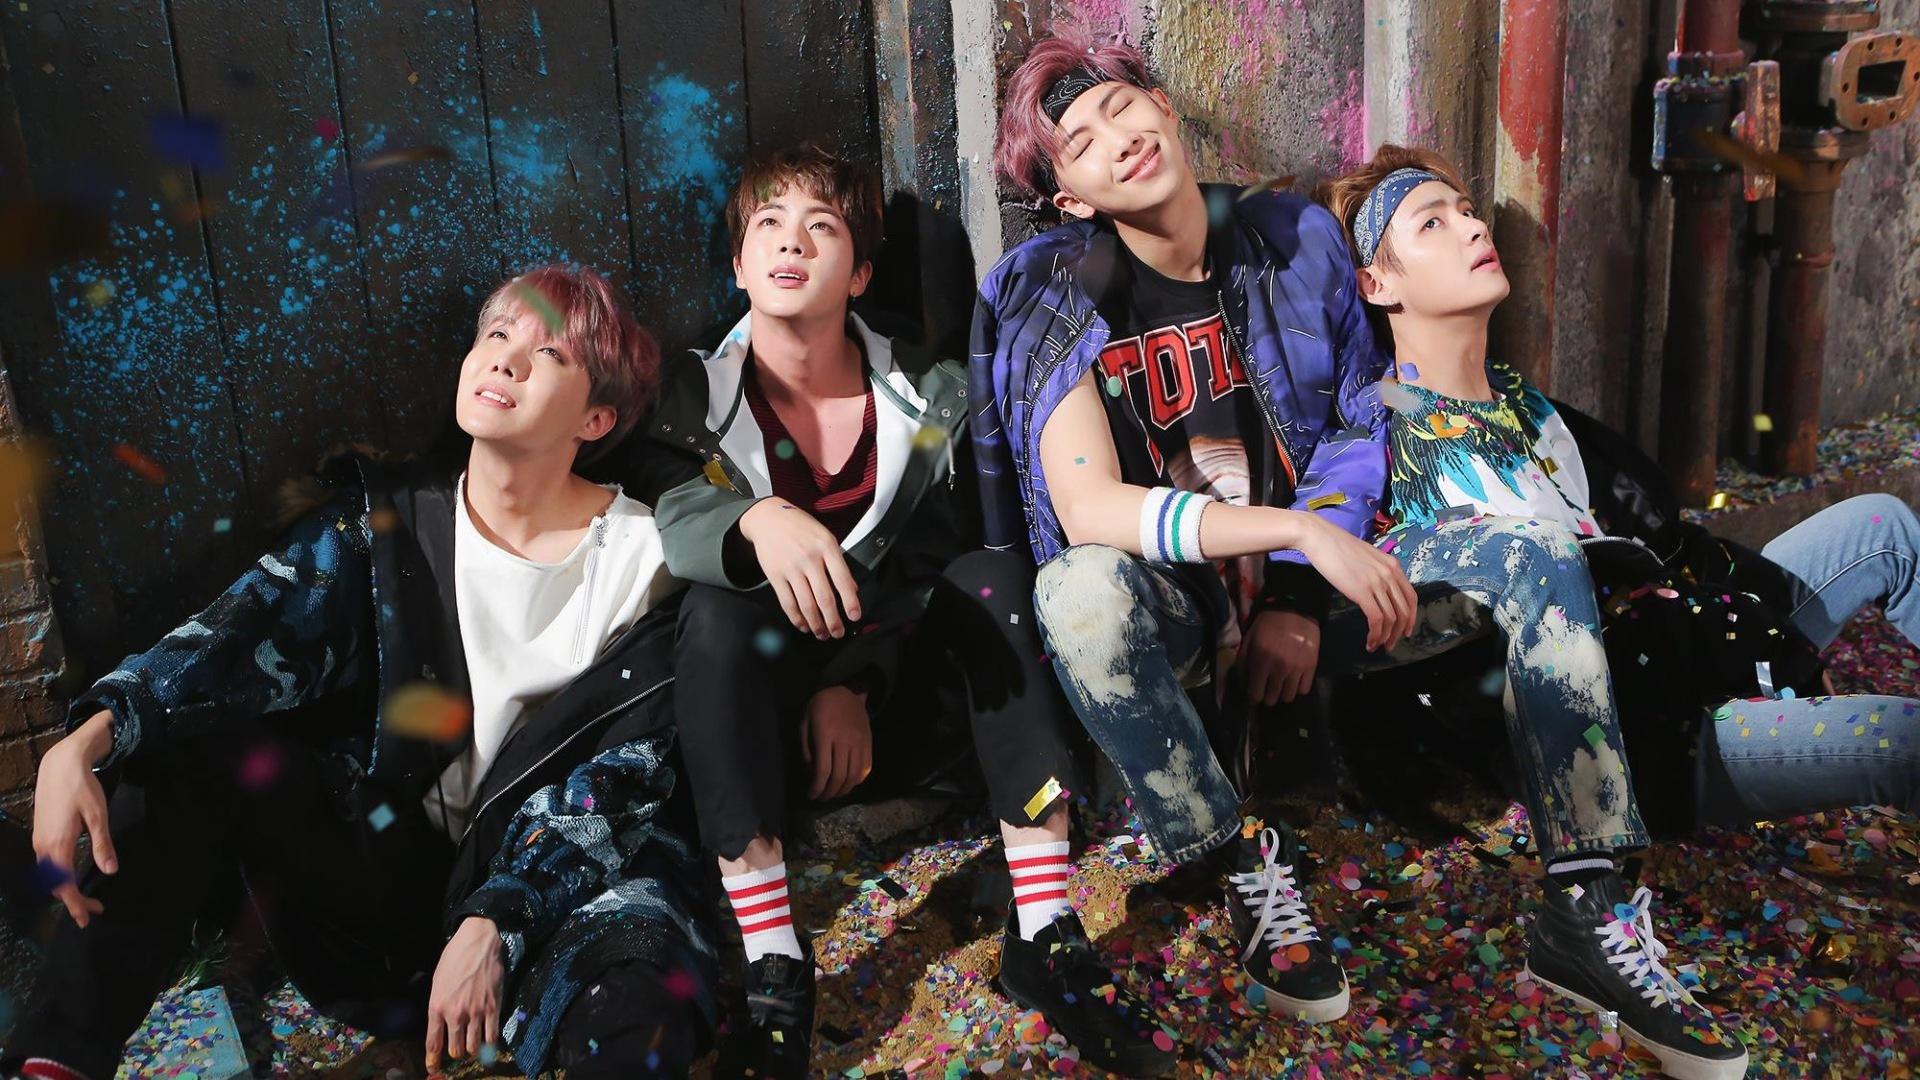 Bts Jin Bts Wallpaper 40936507 Fanpop